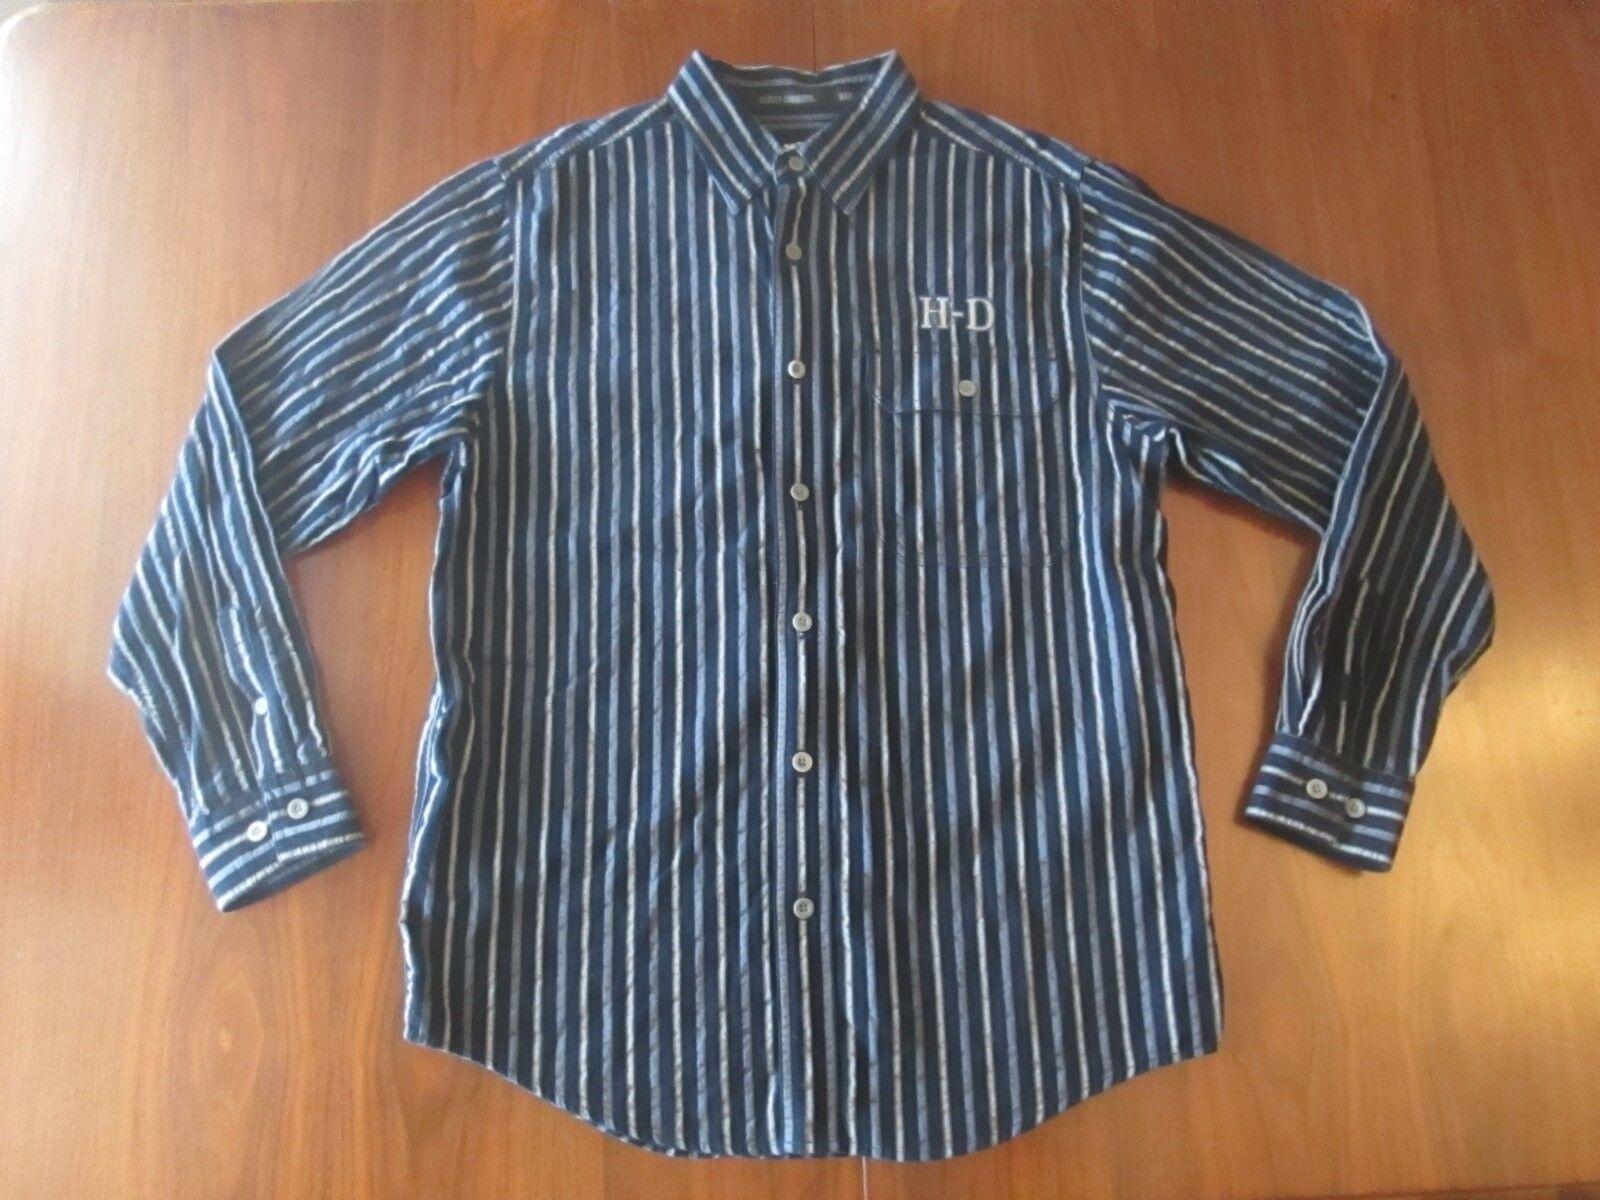 50ec6699 Vintage Work Shirt Style HARLEY DAVIDSON Striped Long Sleeve Button Front  Size M